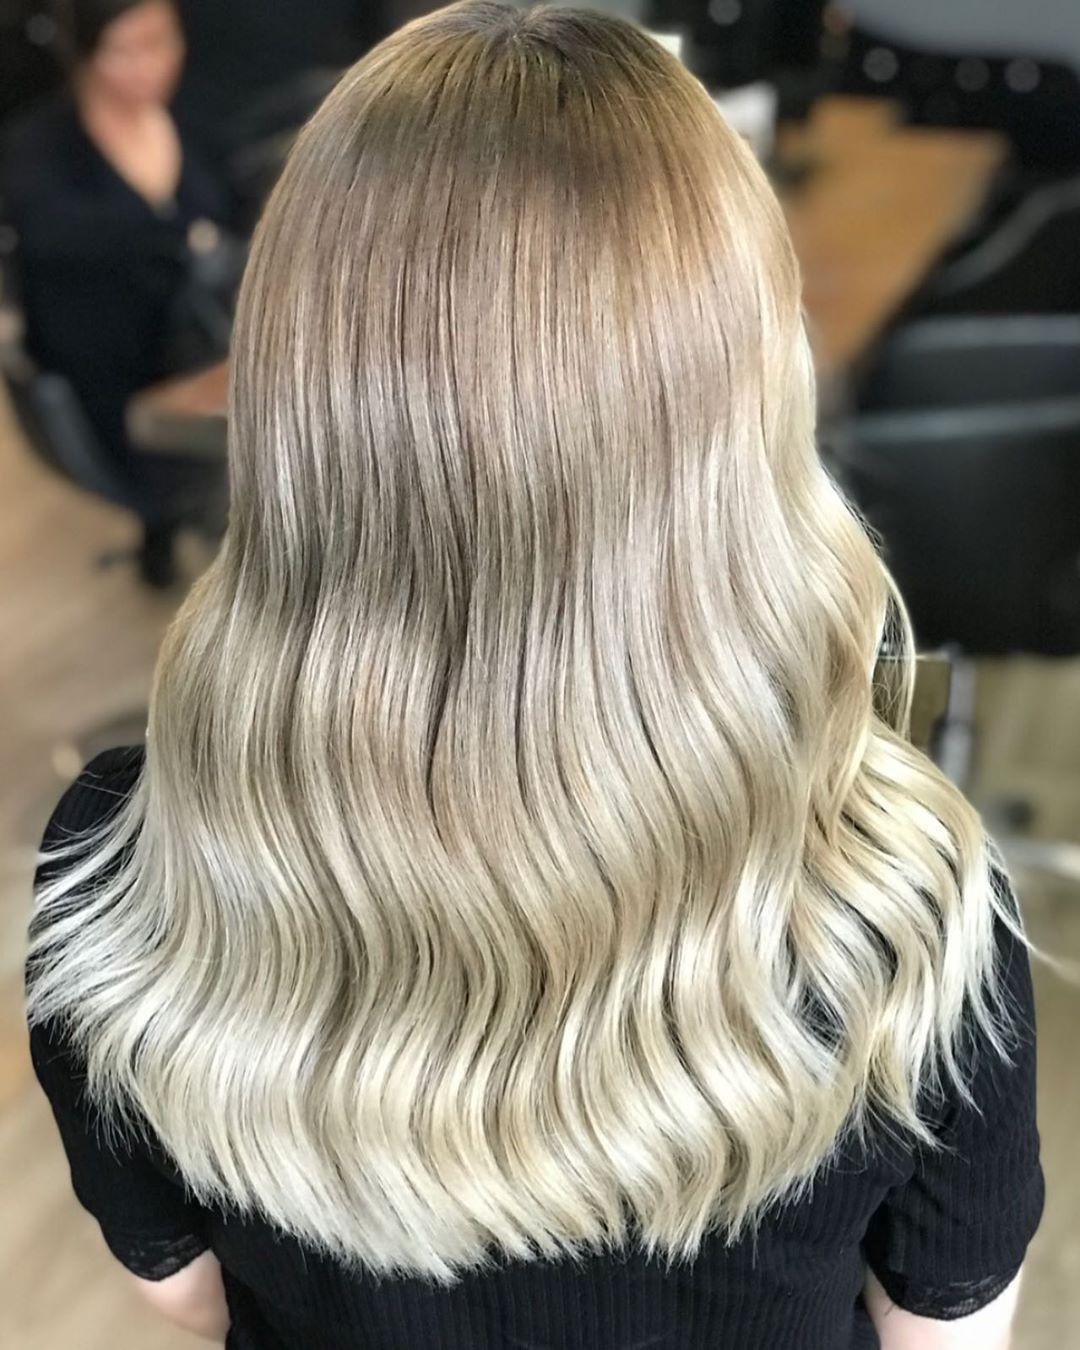 2019 S 26 Best Hair Styles Sac Stilleri Uzun Sac Sac